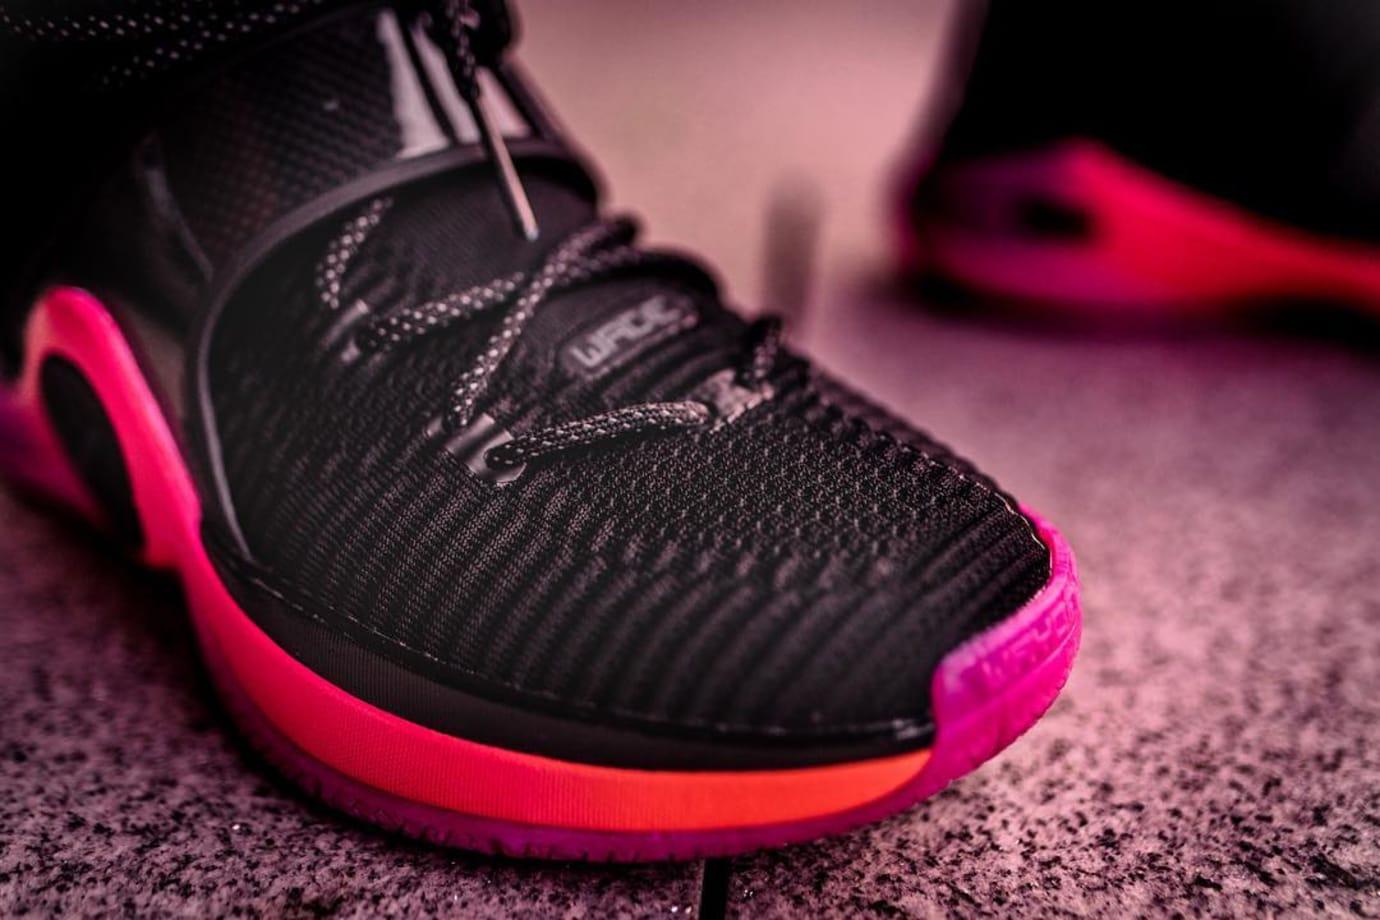 Li-Ning Way of Wade 6 Black/Pink Release Date Toe